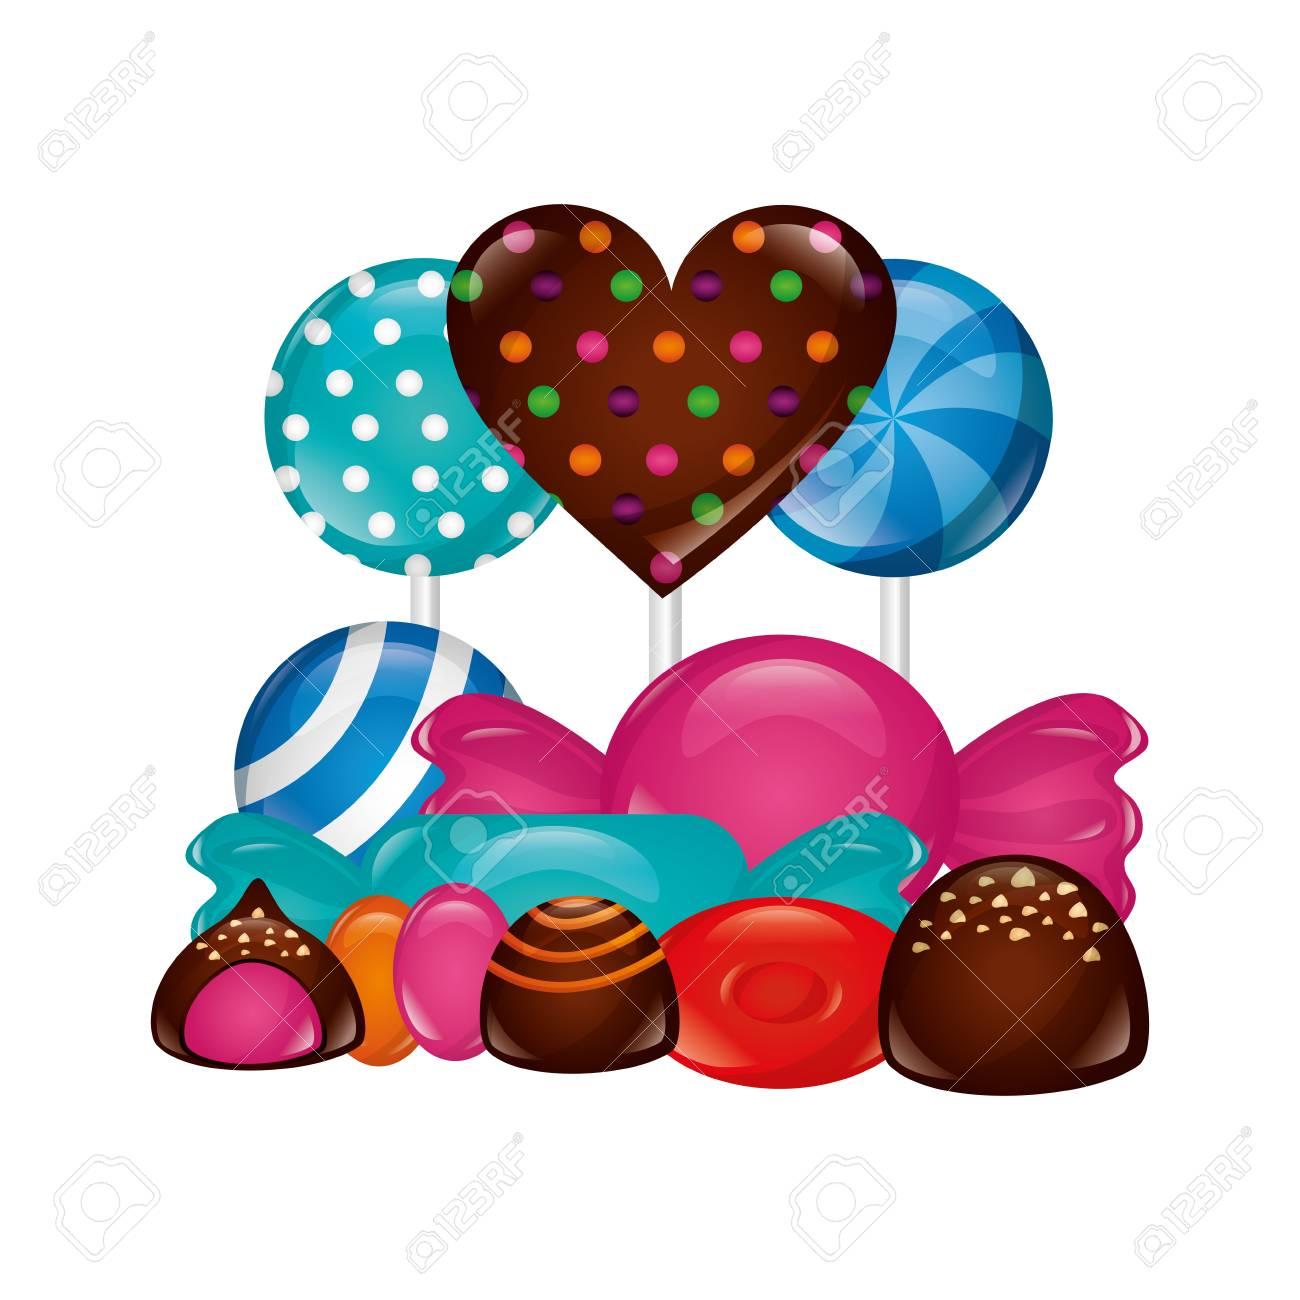 Chocolate Heart Clip Art